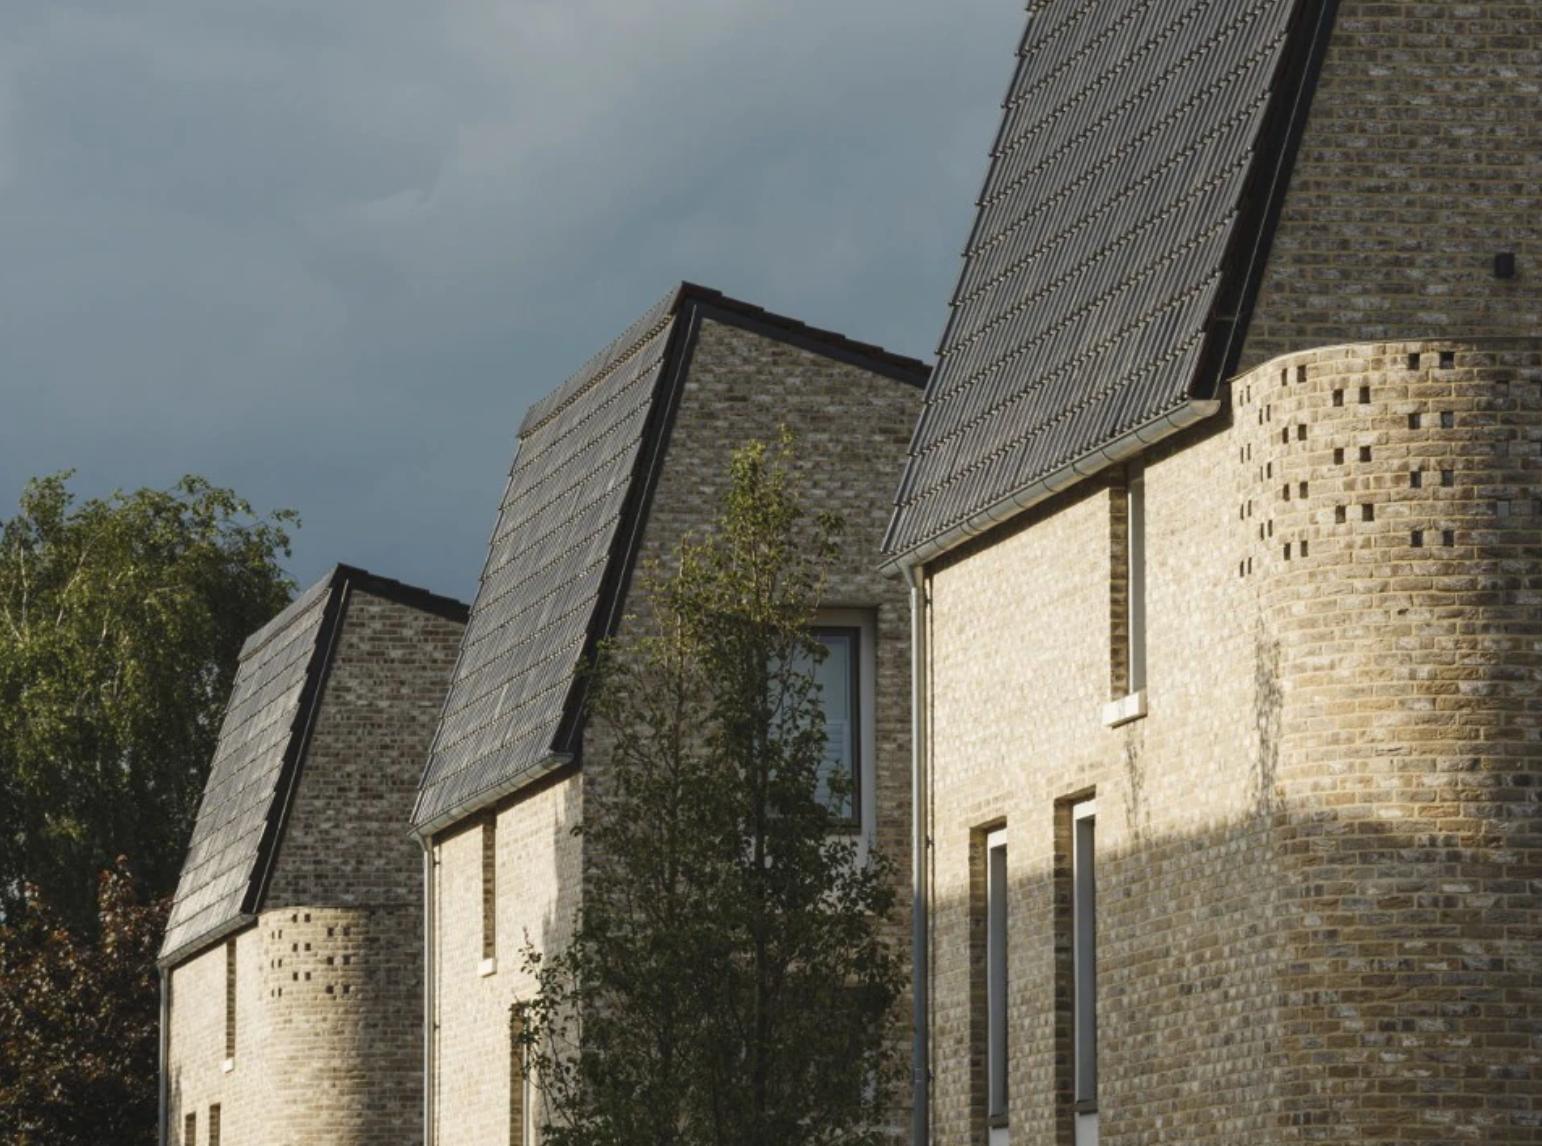 Goldsmith Street, Norwich roofing